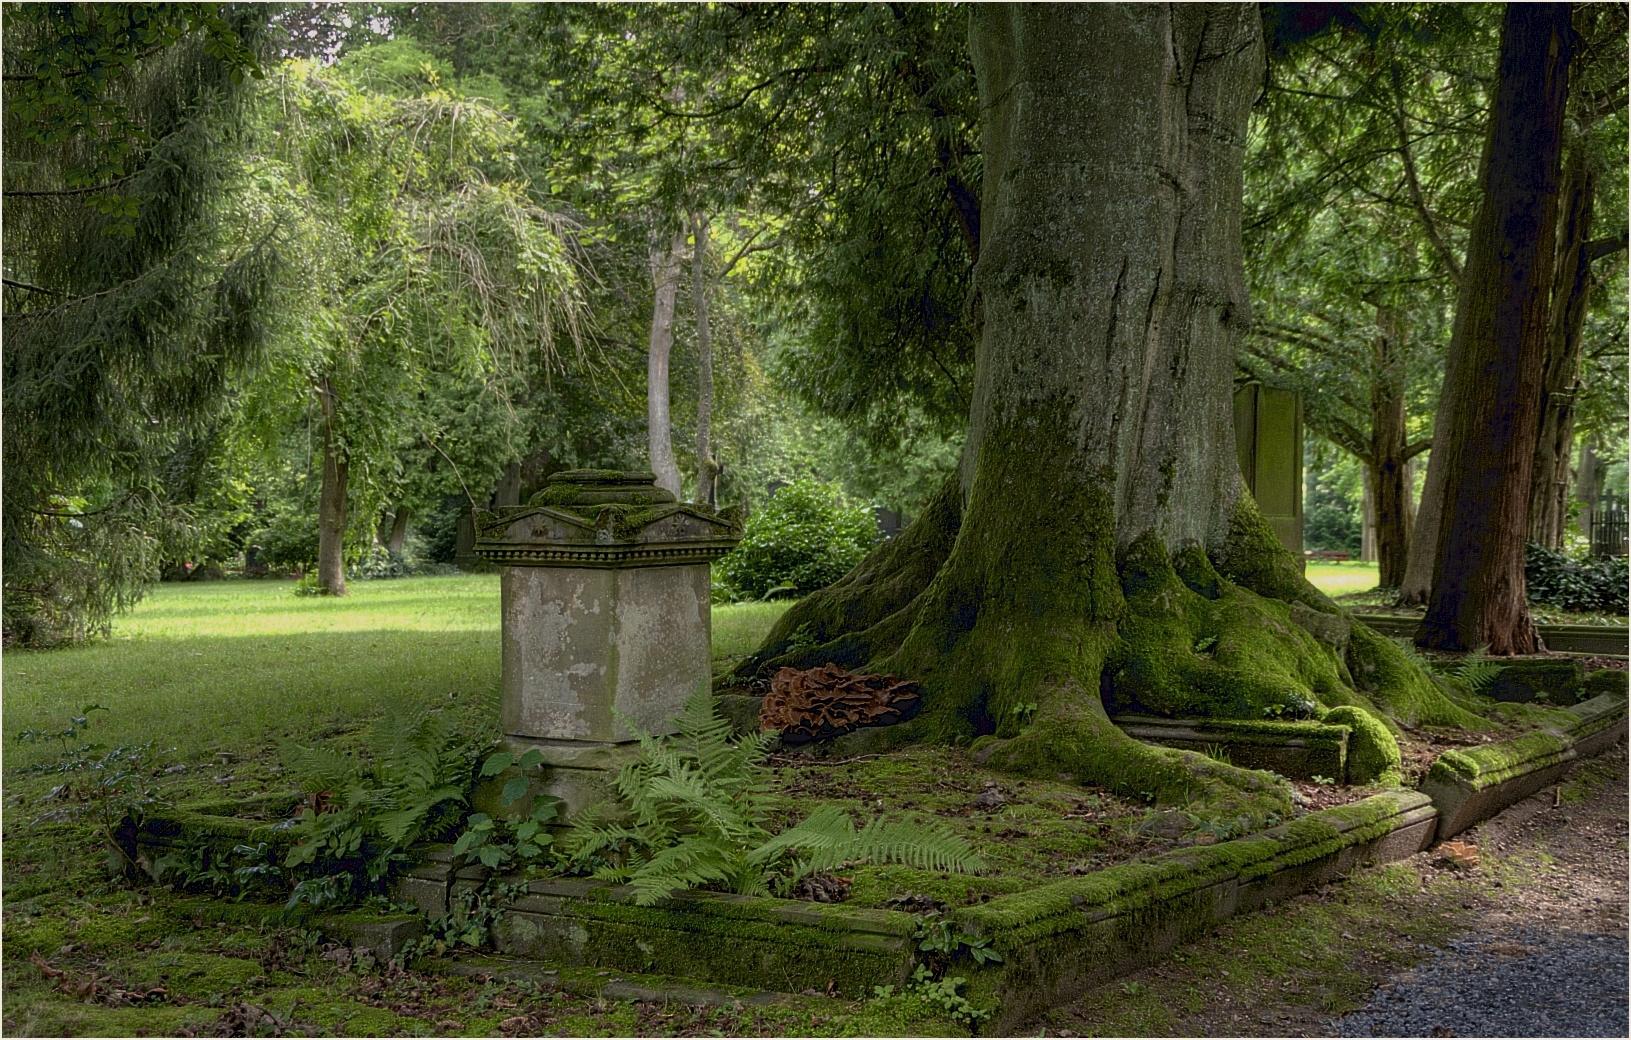 ~~Alter Friedhof in Gießen~~